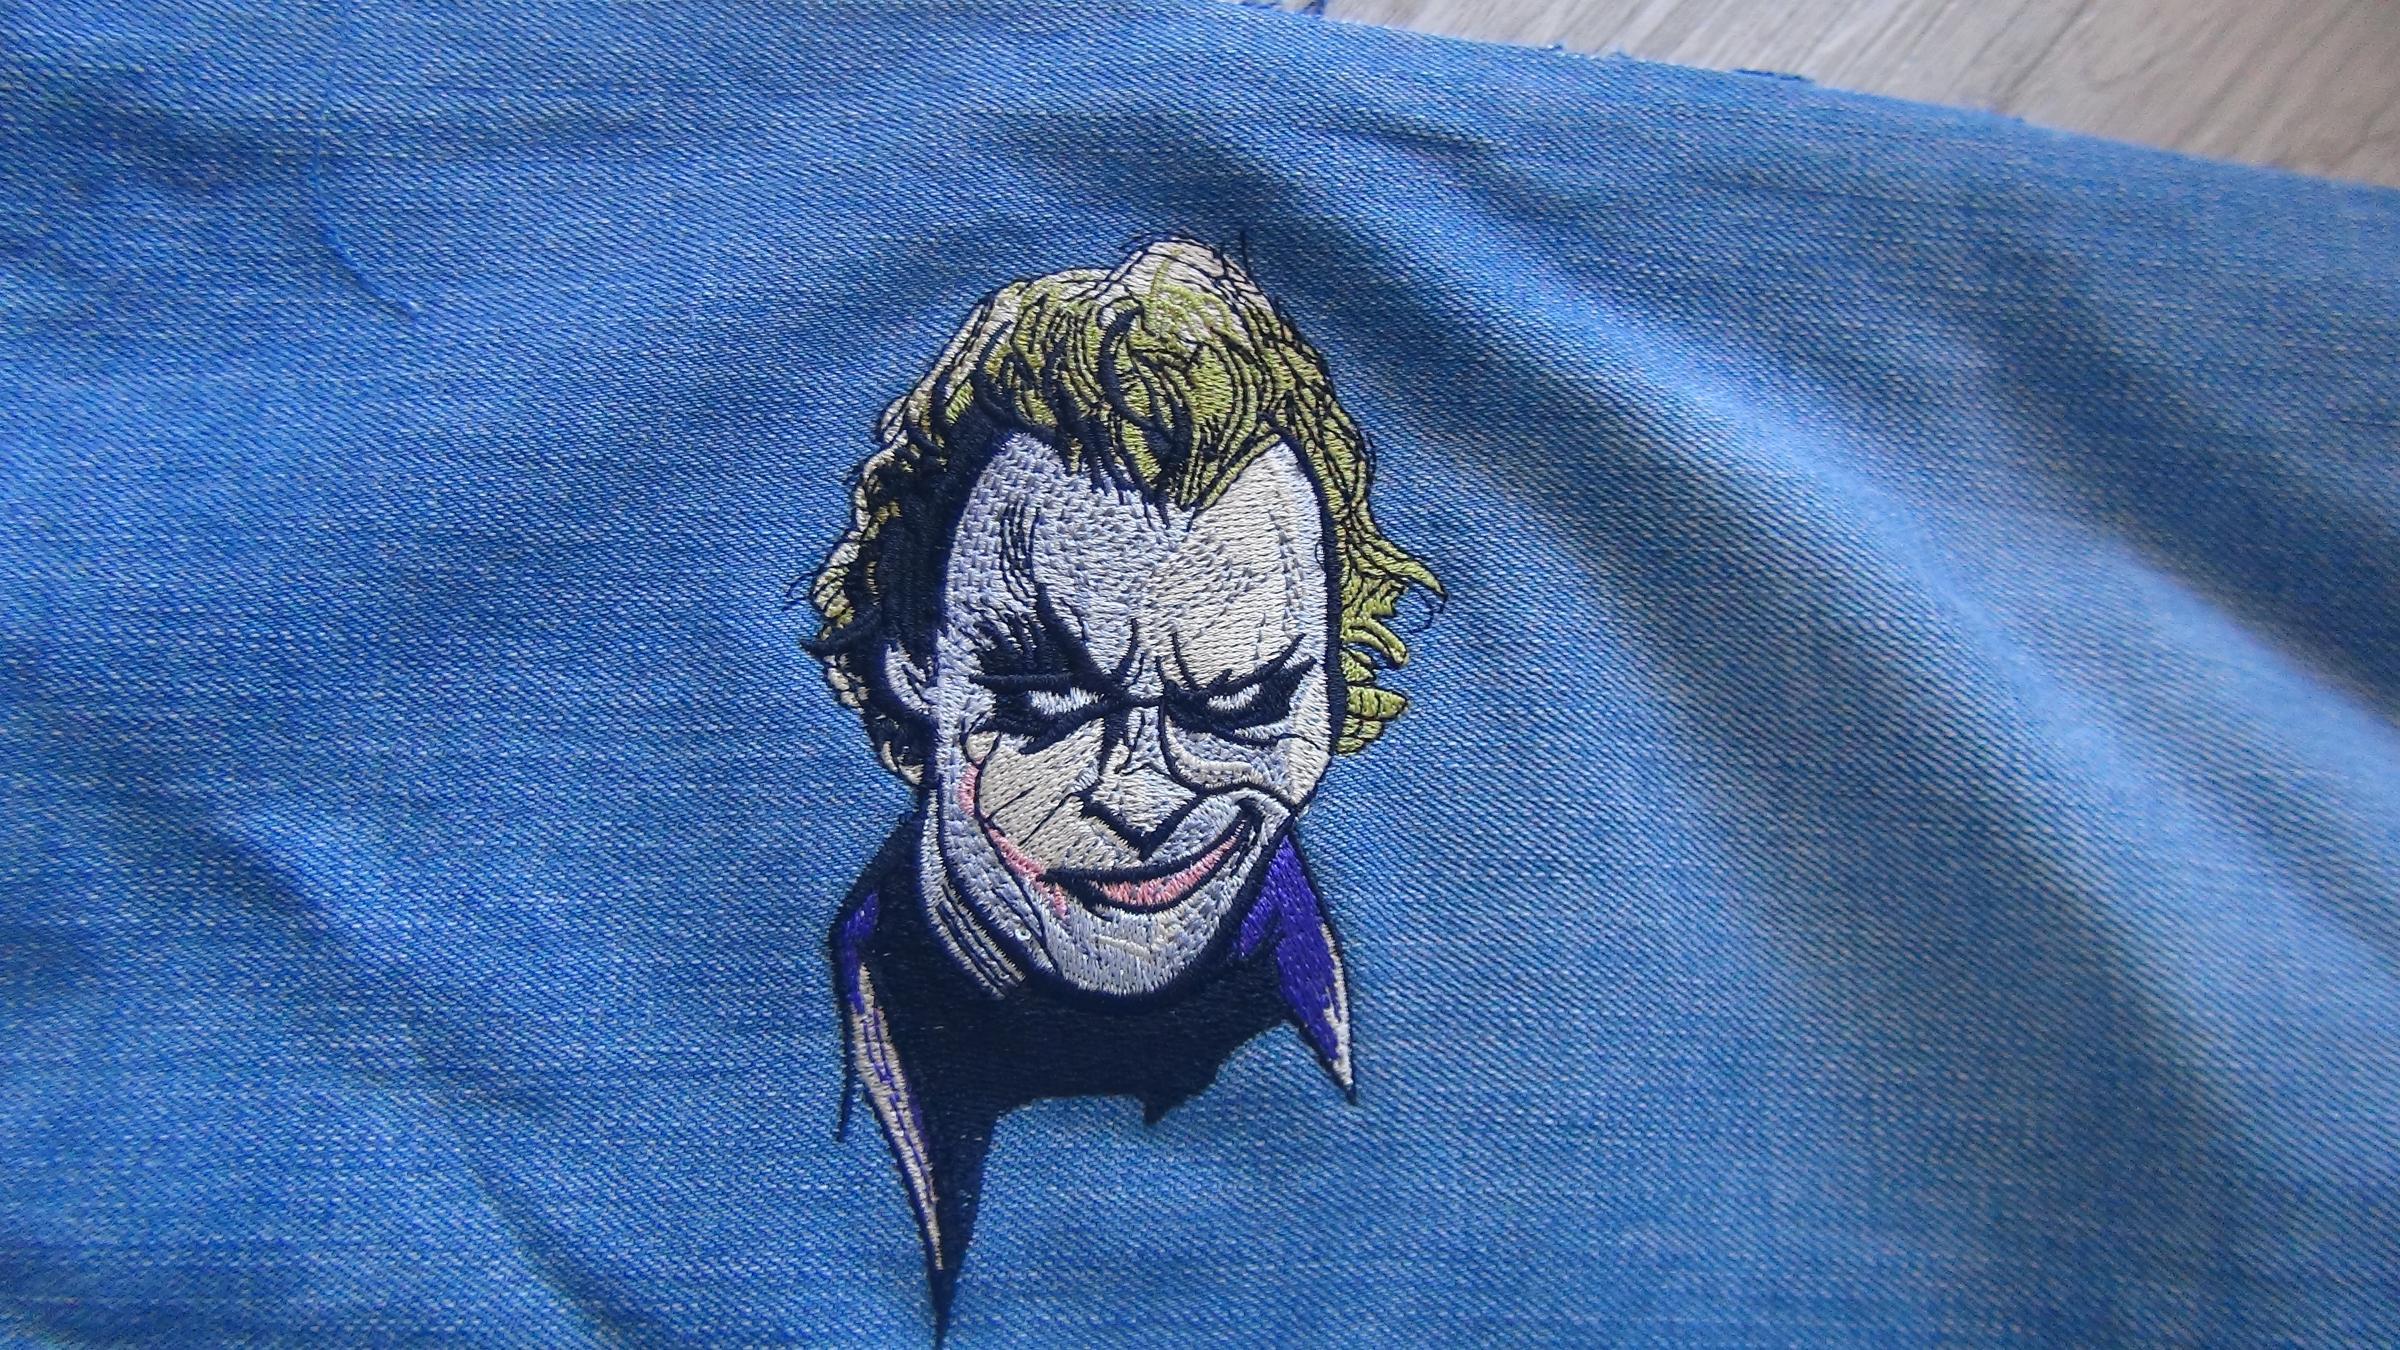 Joker embroidery design finished